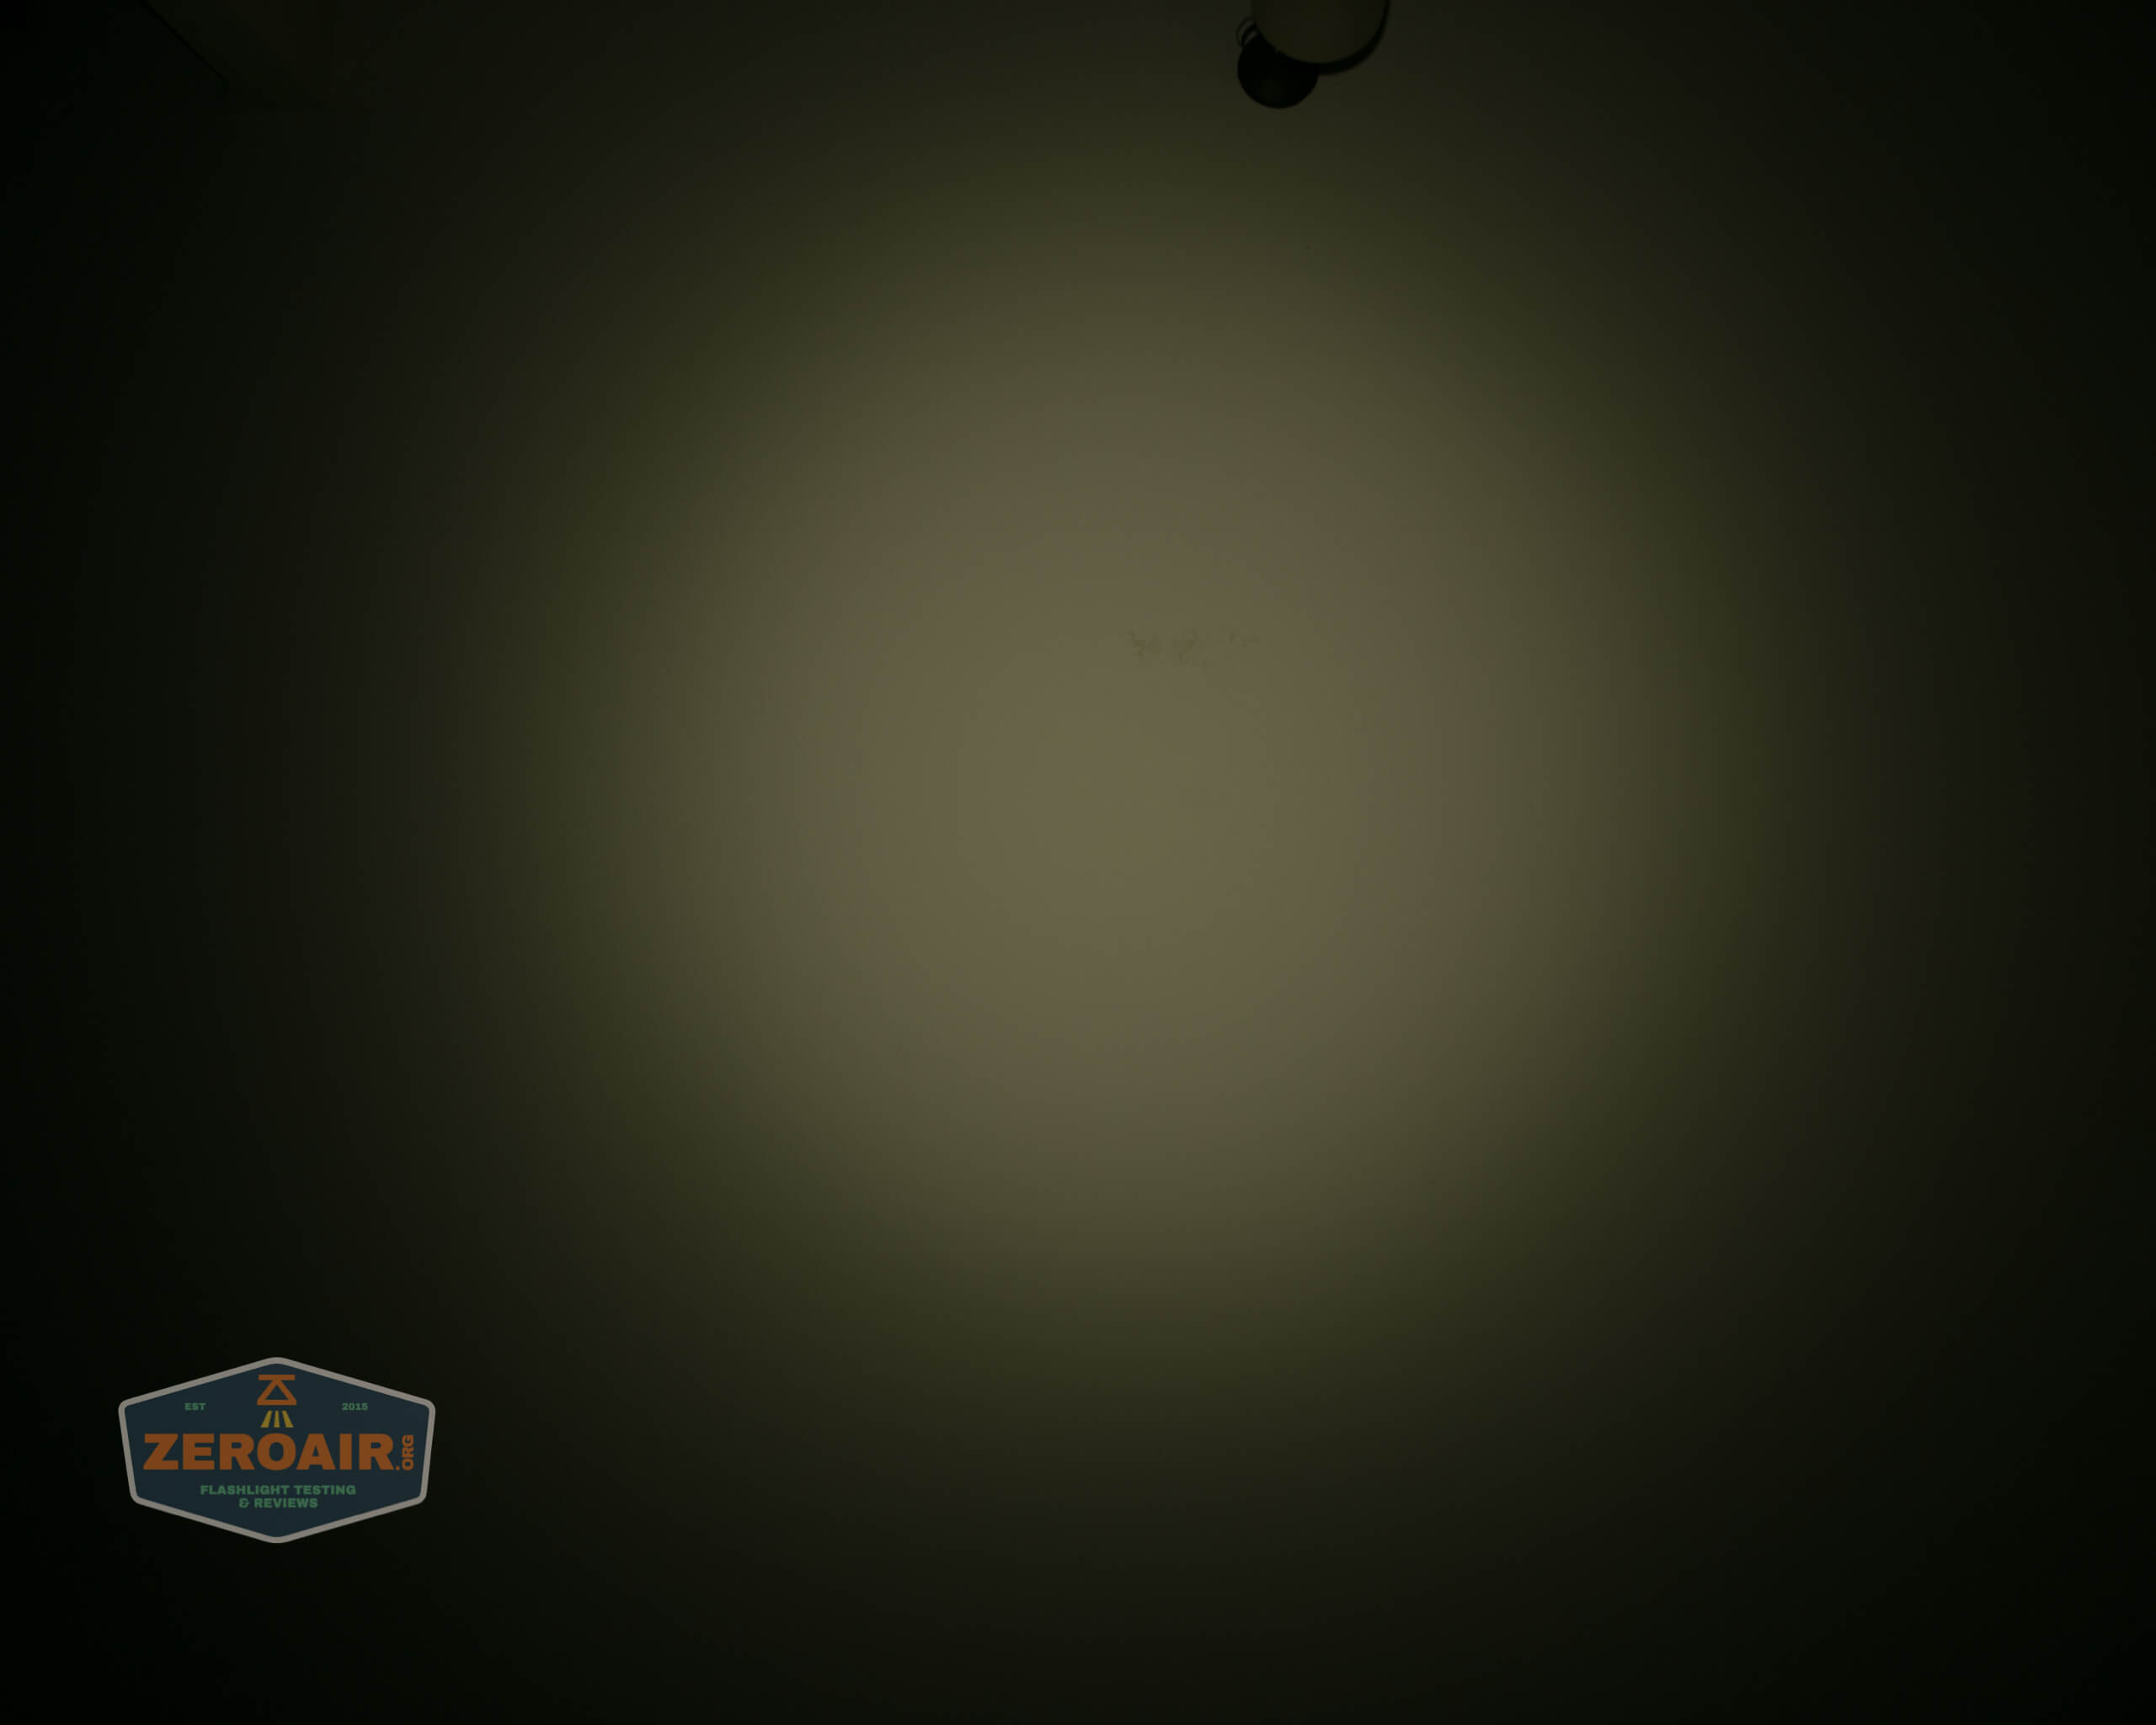 manker e14iii 18650 flood flashlight beamshot ceiling 6